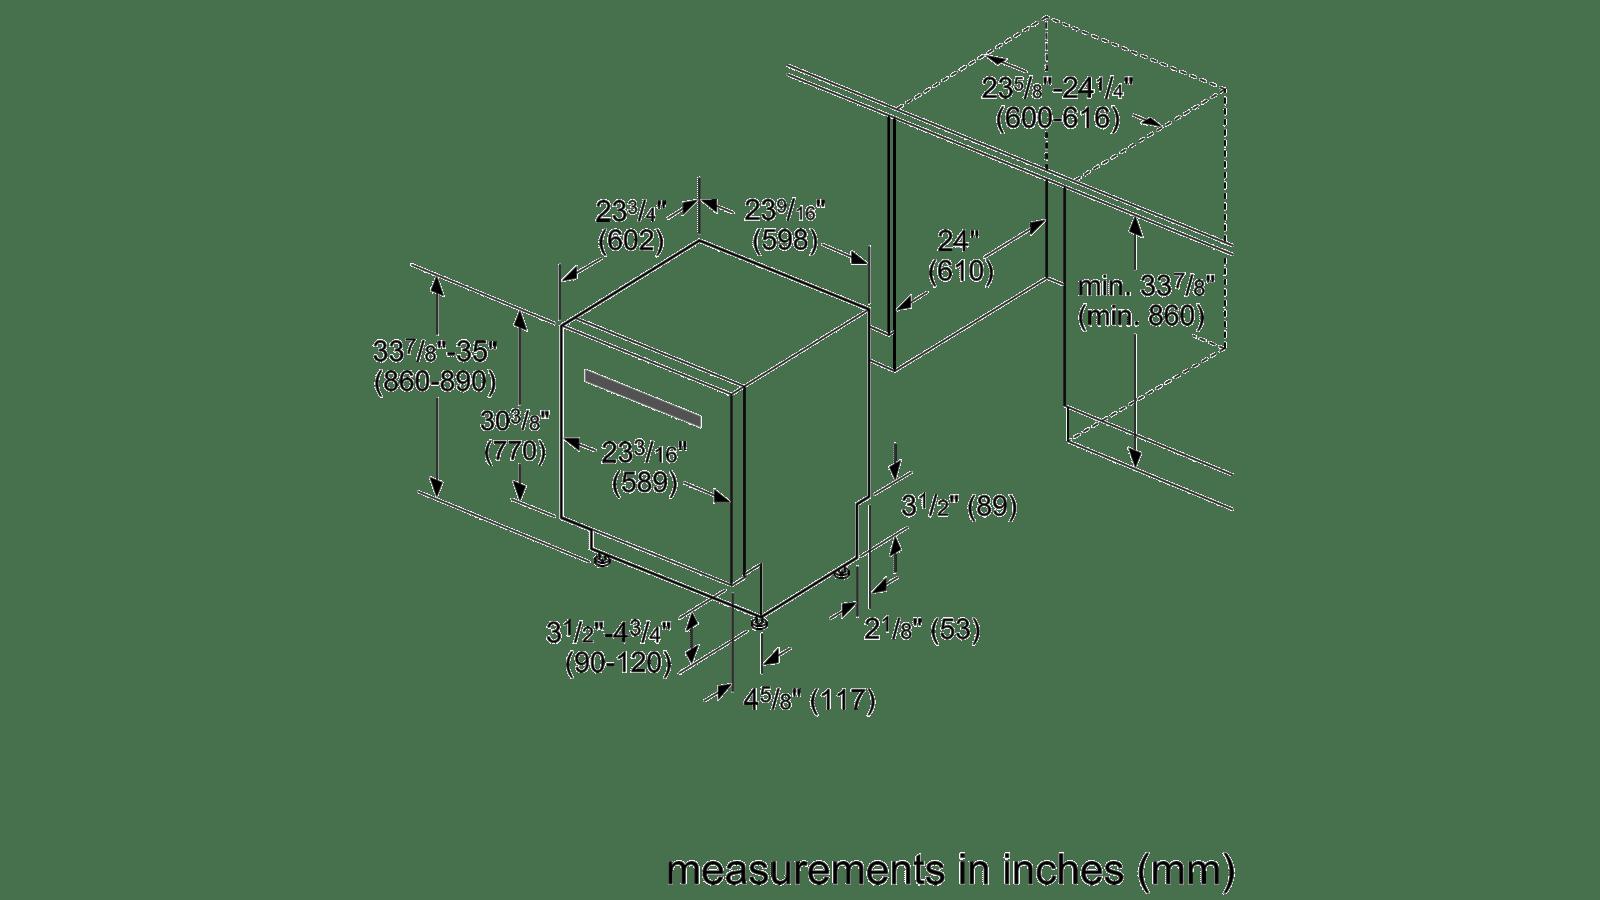 wiring diagram bosch dishwasher shx5av55uc bosch shs63vl5uc dishwasher  bosch shs63vl5uc dishwasher